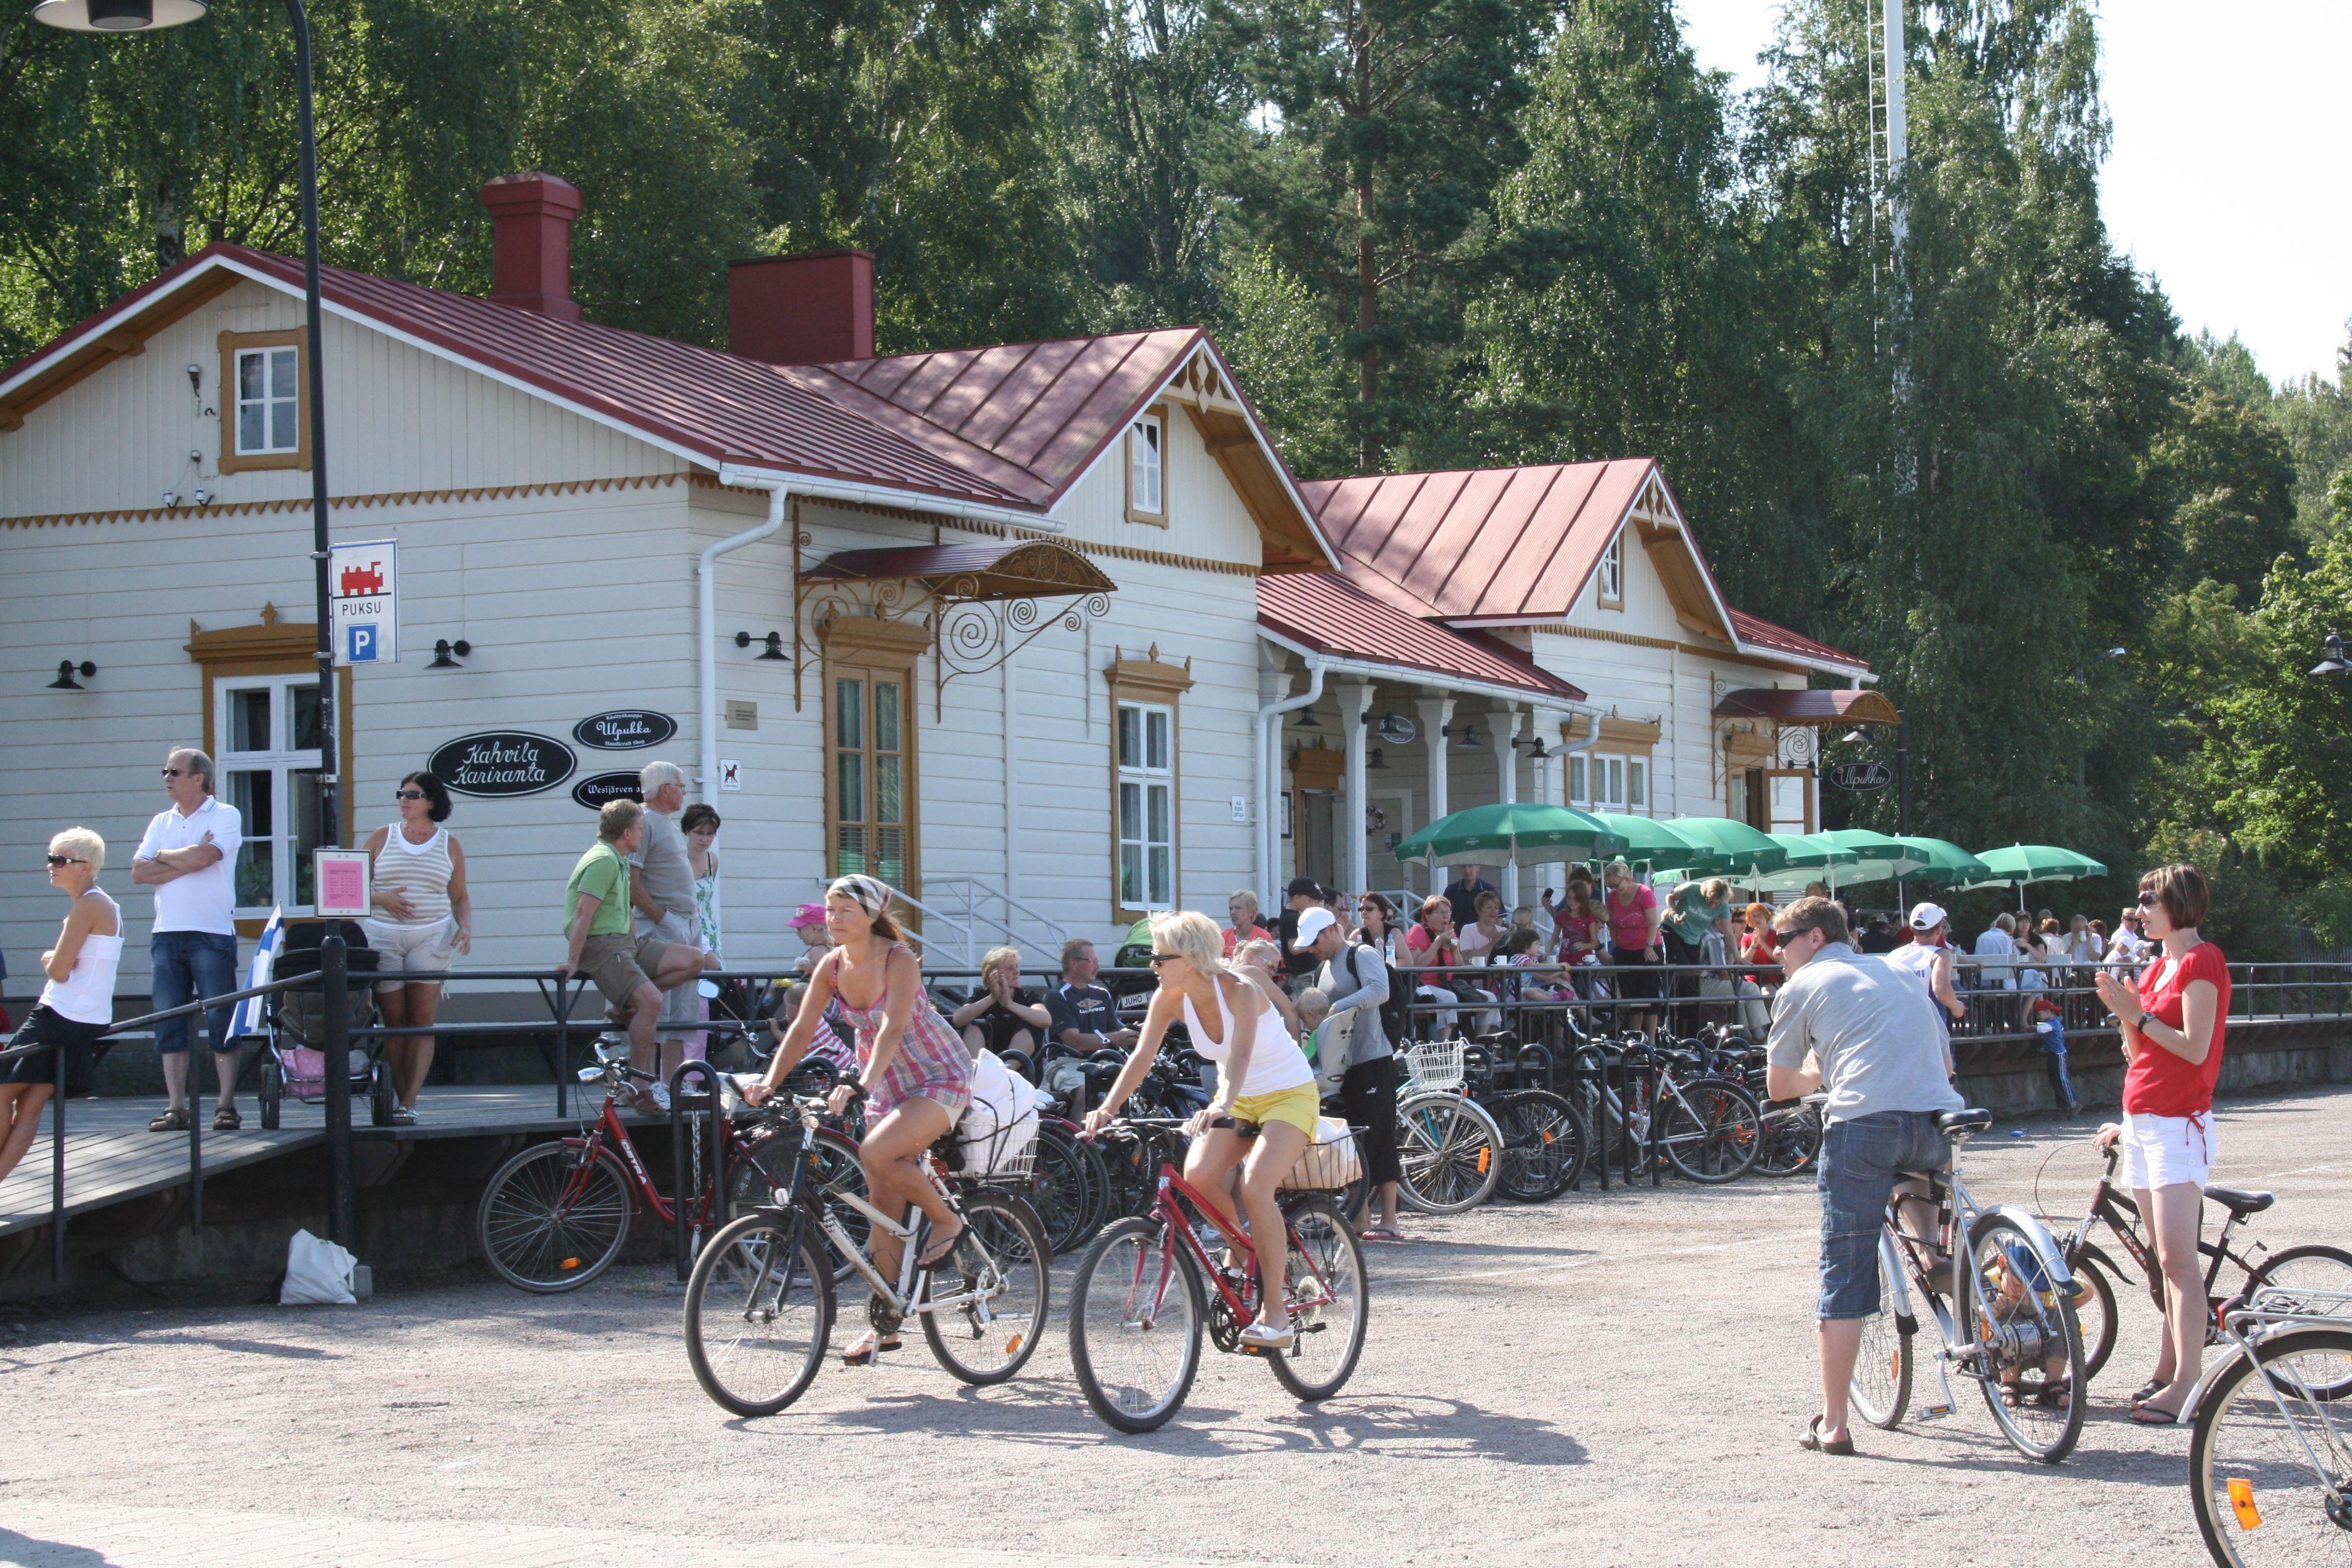 Lahti Harbour - Summer living room of Lahti